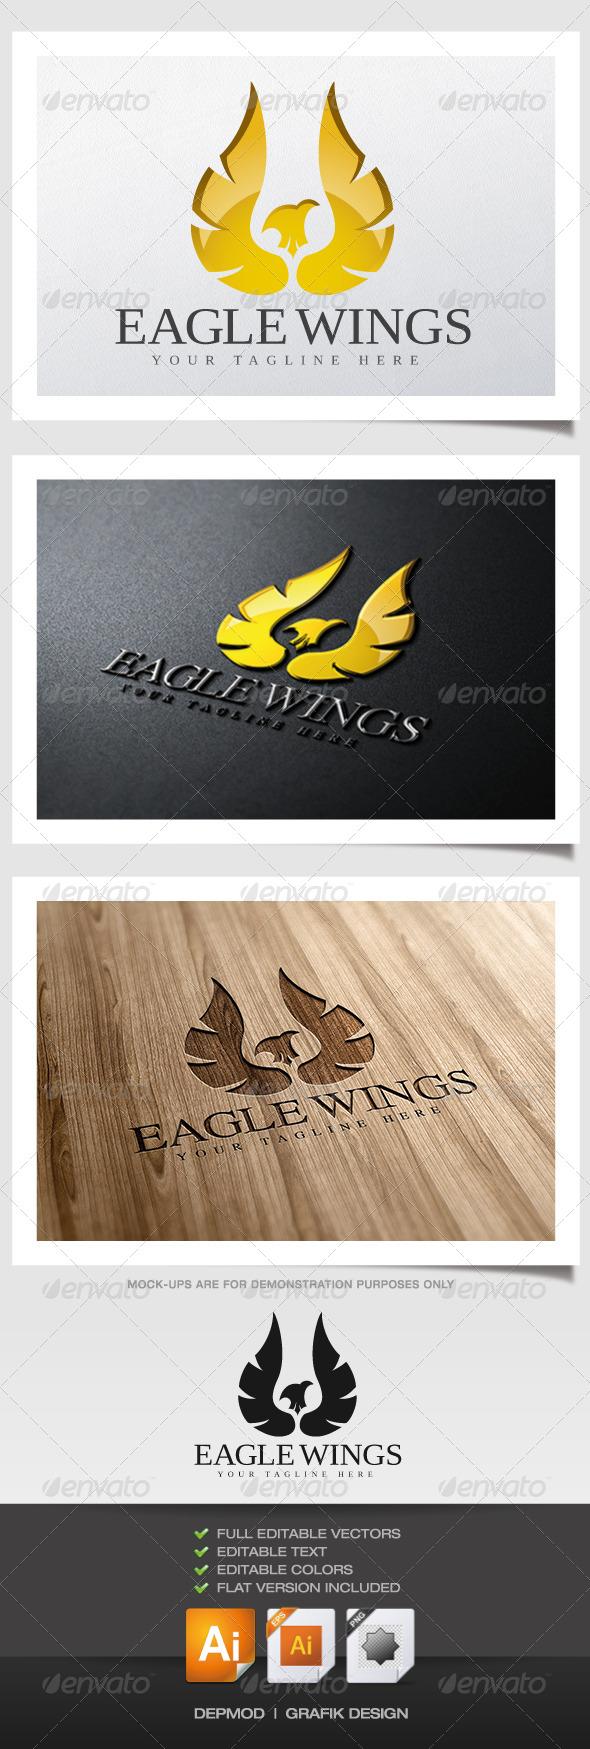 GraphicRiver Eagle Wings Logo 5879913